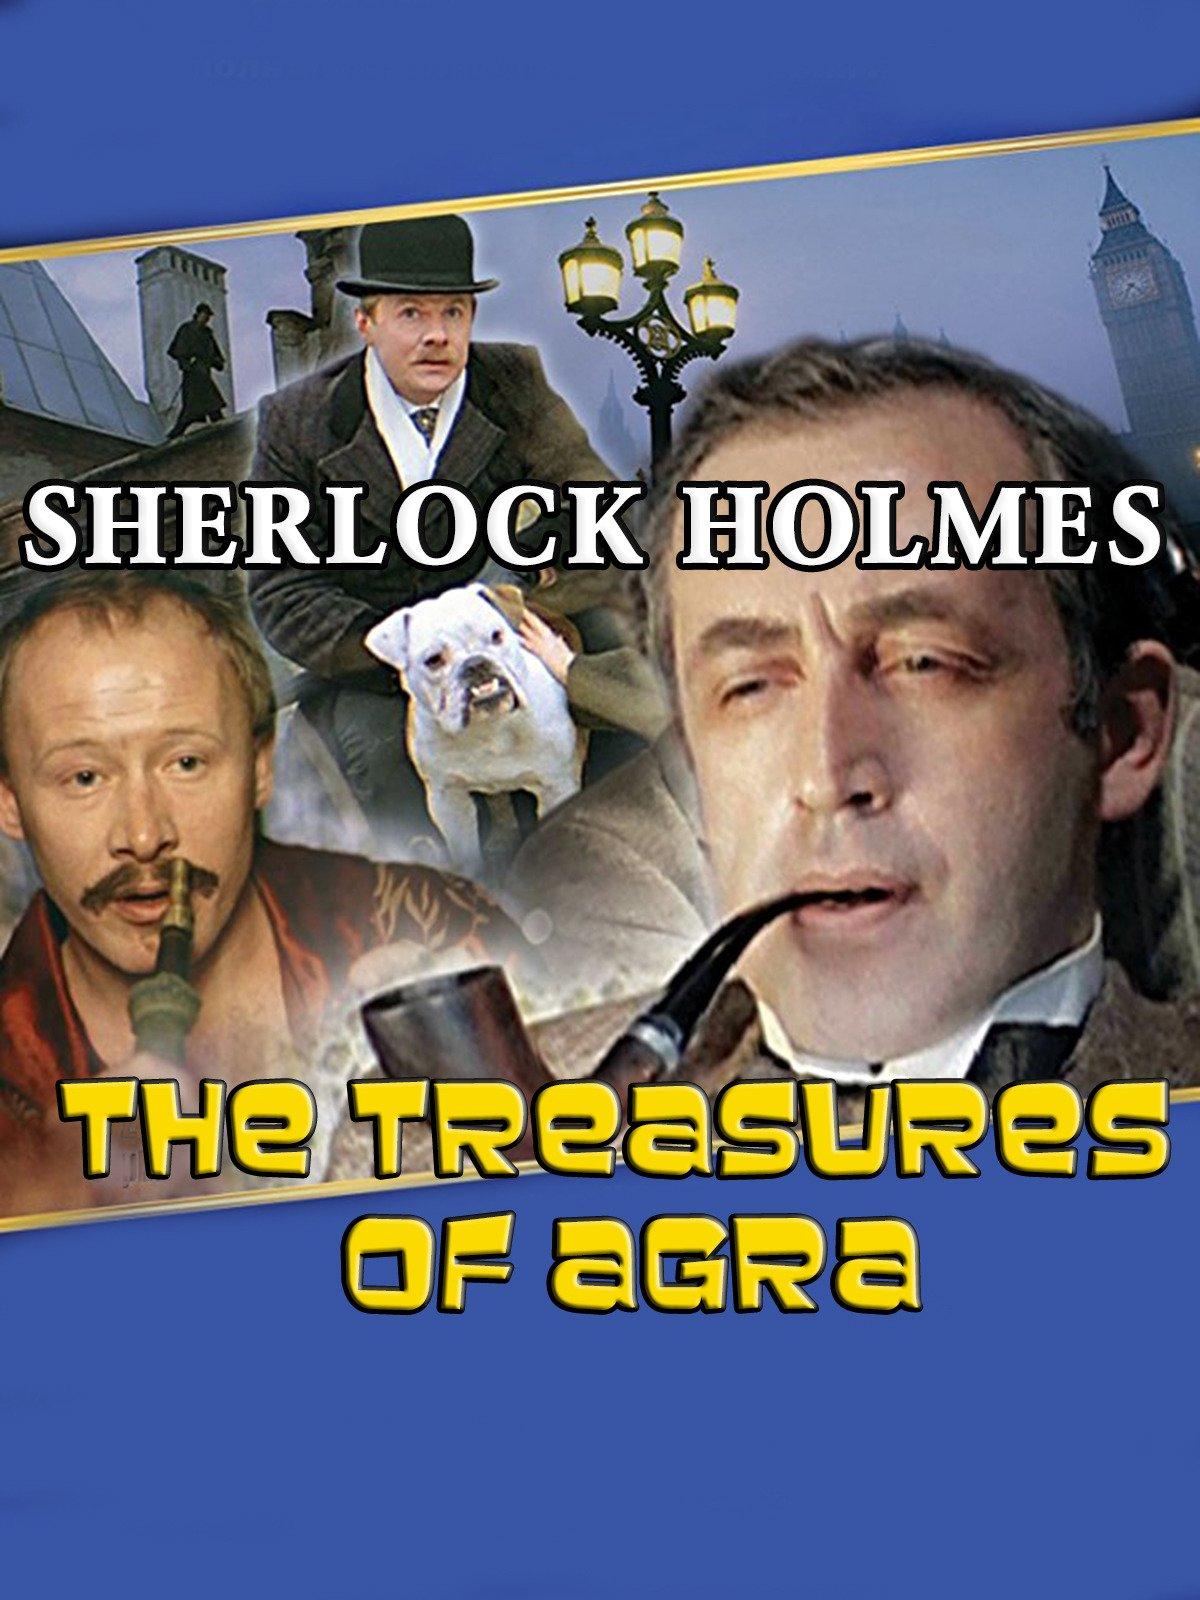 Sherlock Holmes: The Treasures of Agra on Amazon Prime Video UK